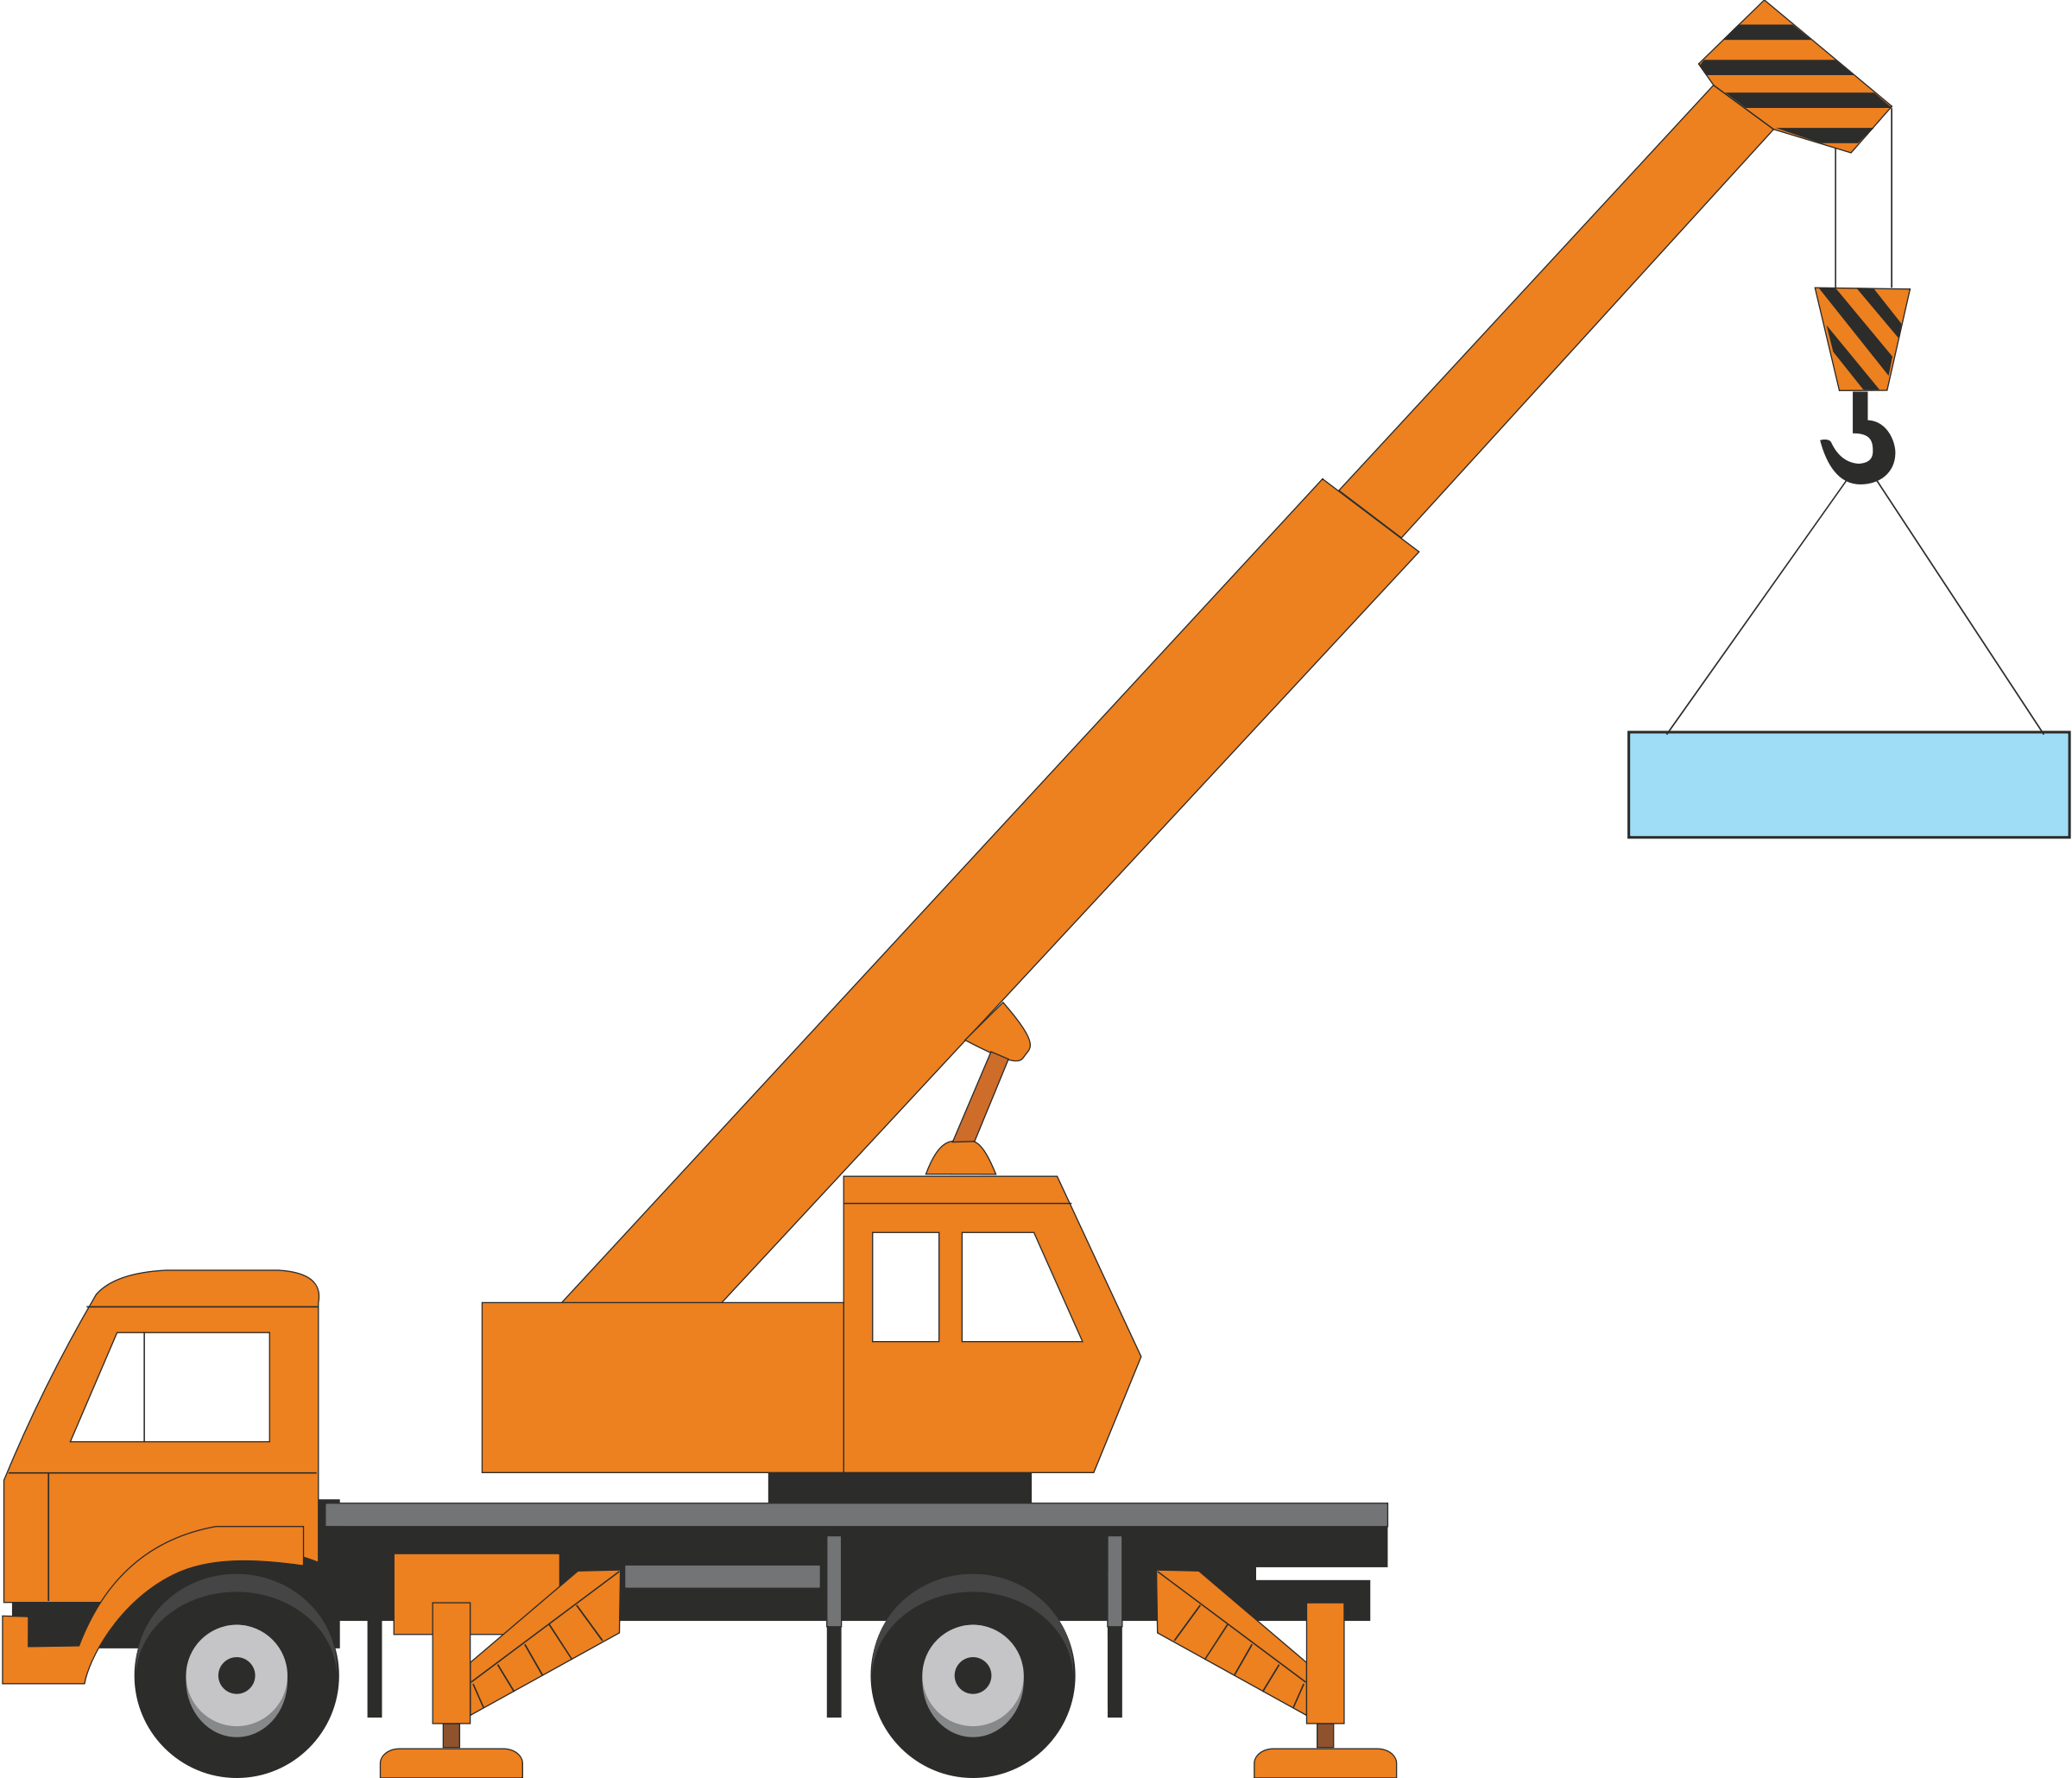 Crane Clipart #1